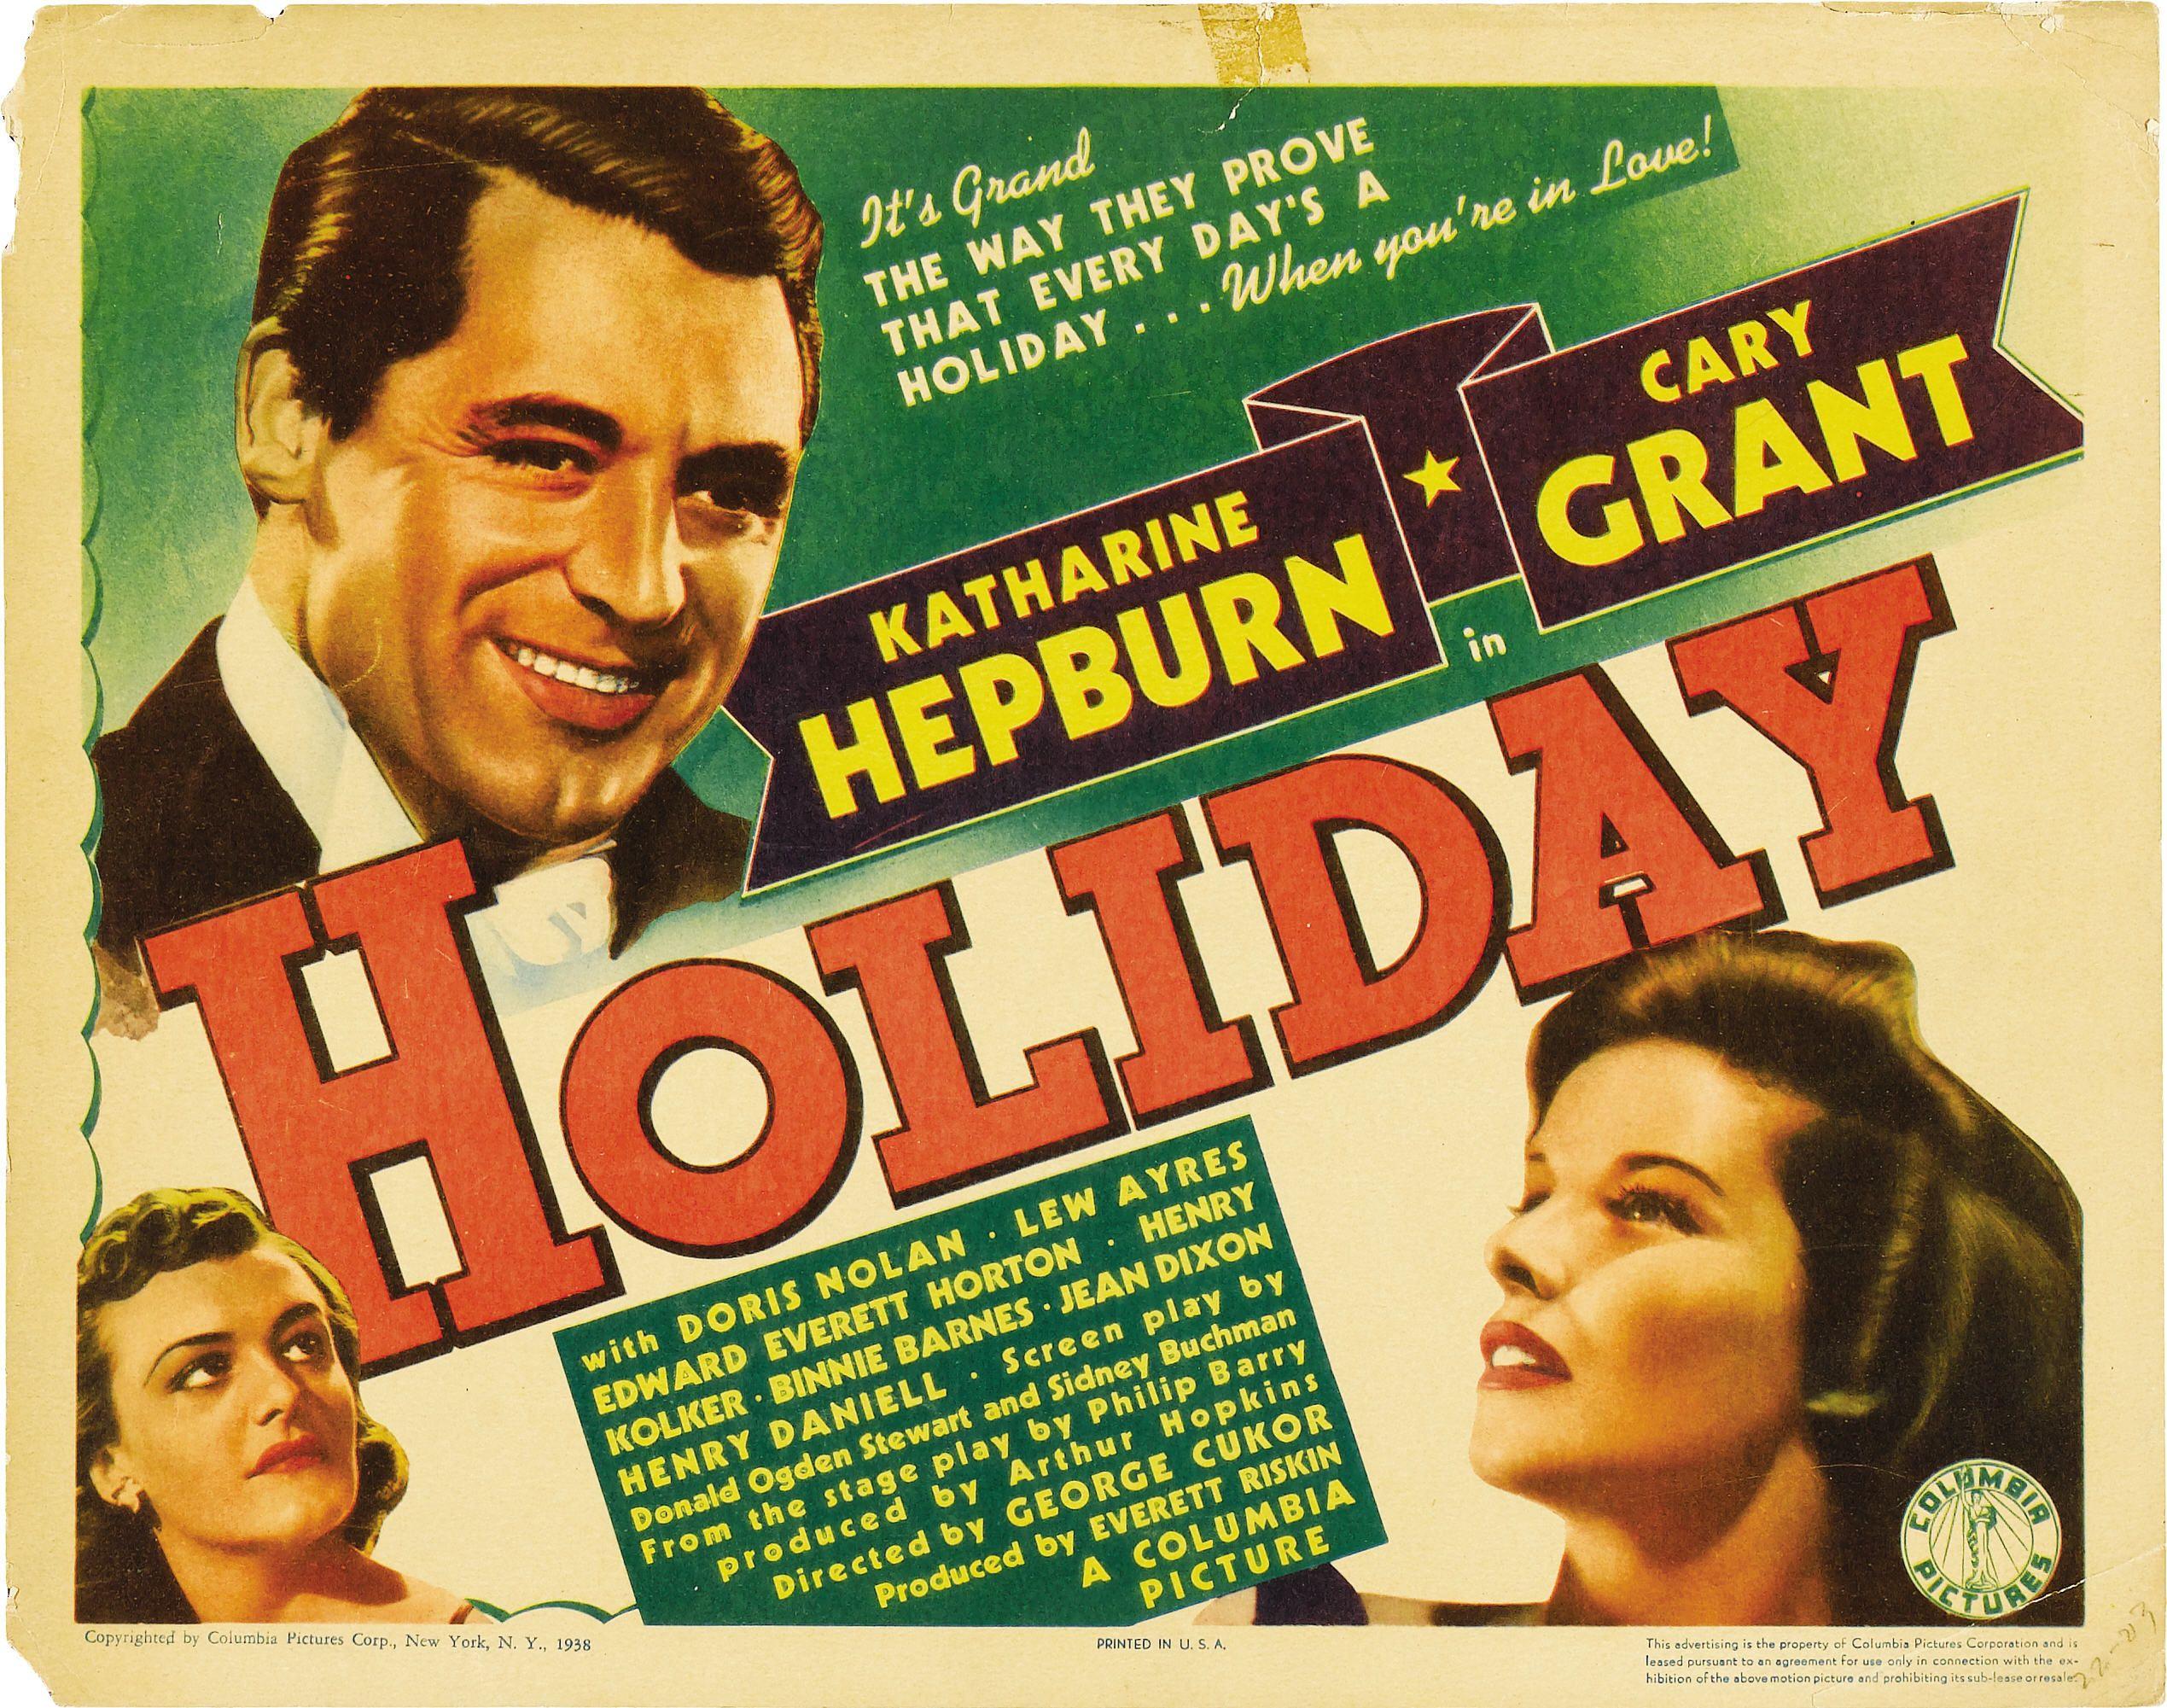 Cary Grant Holiday, 1938 | Cary Grant | Pinterest | Cary grant